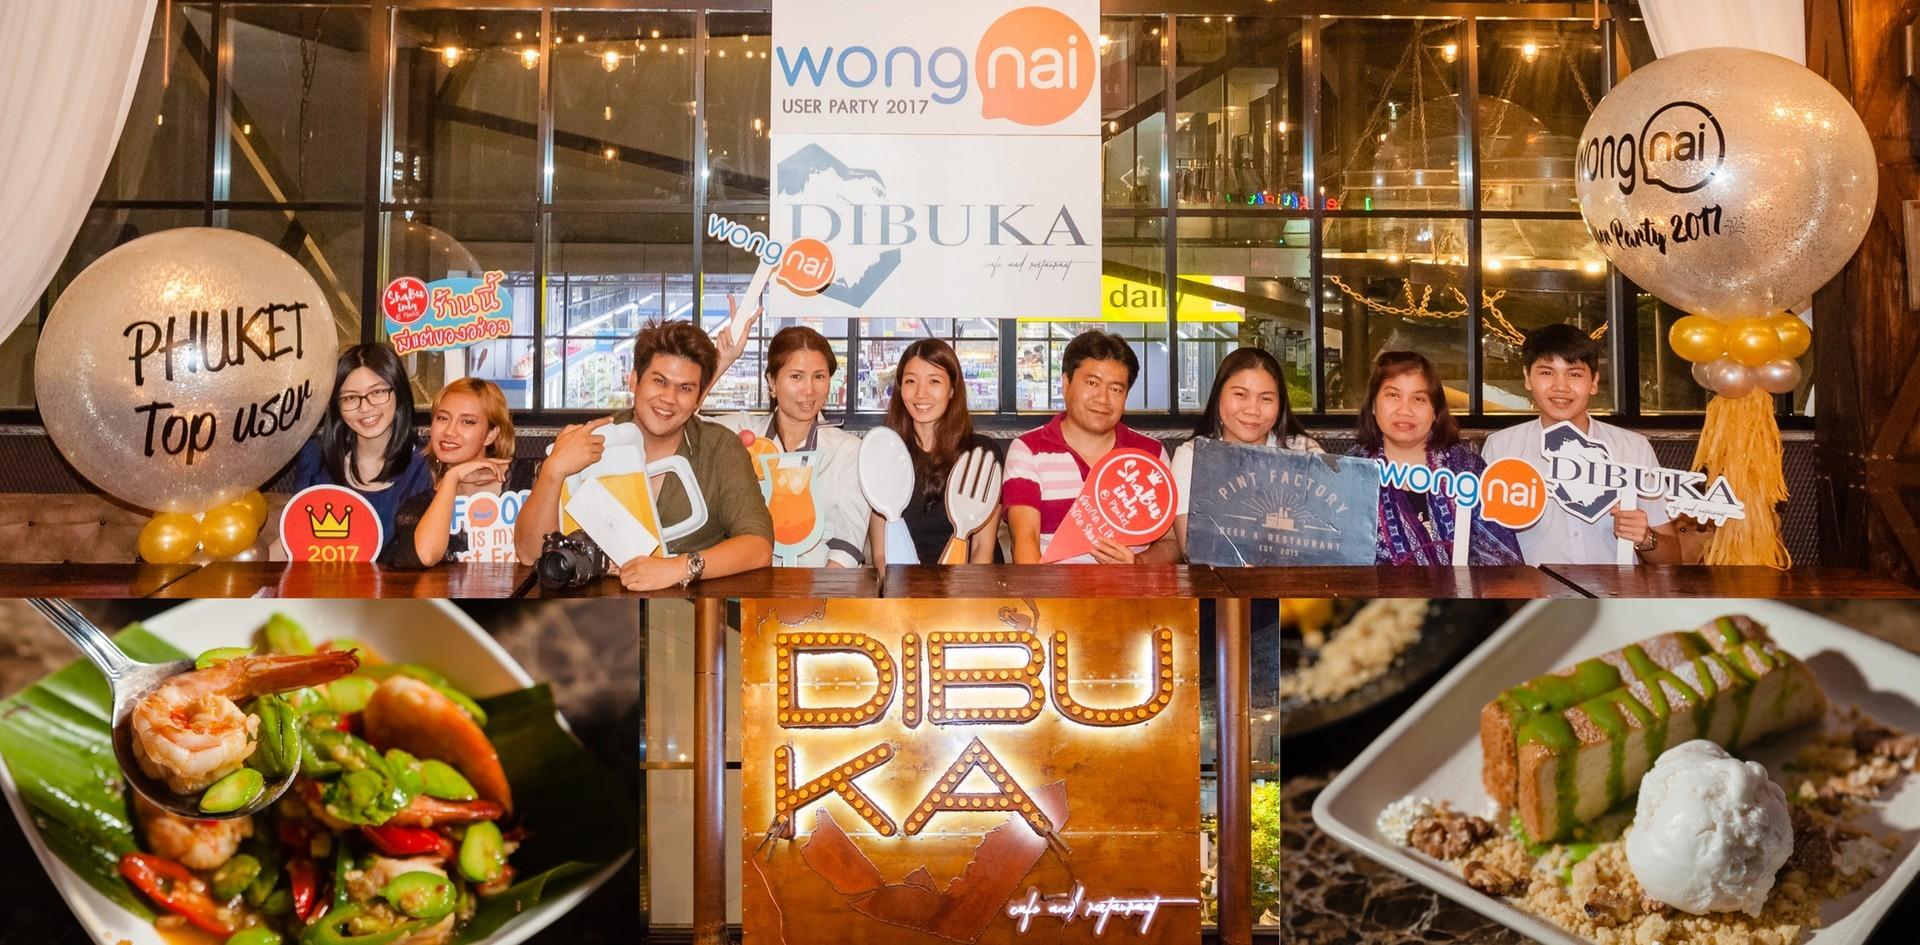 Wongnai Phuket Top User Party ครั้งที่ 4 @DIBUKA